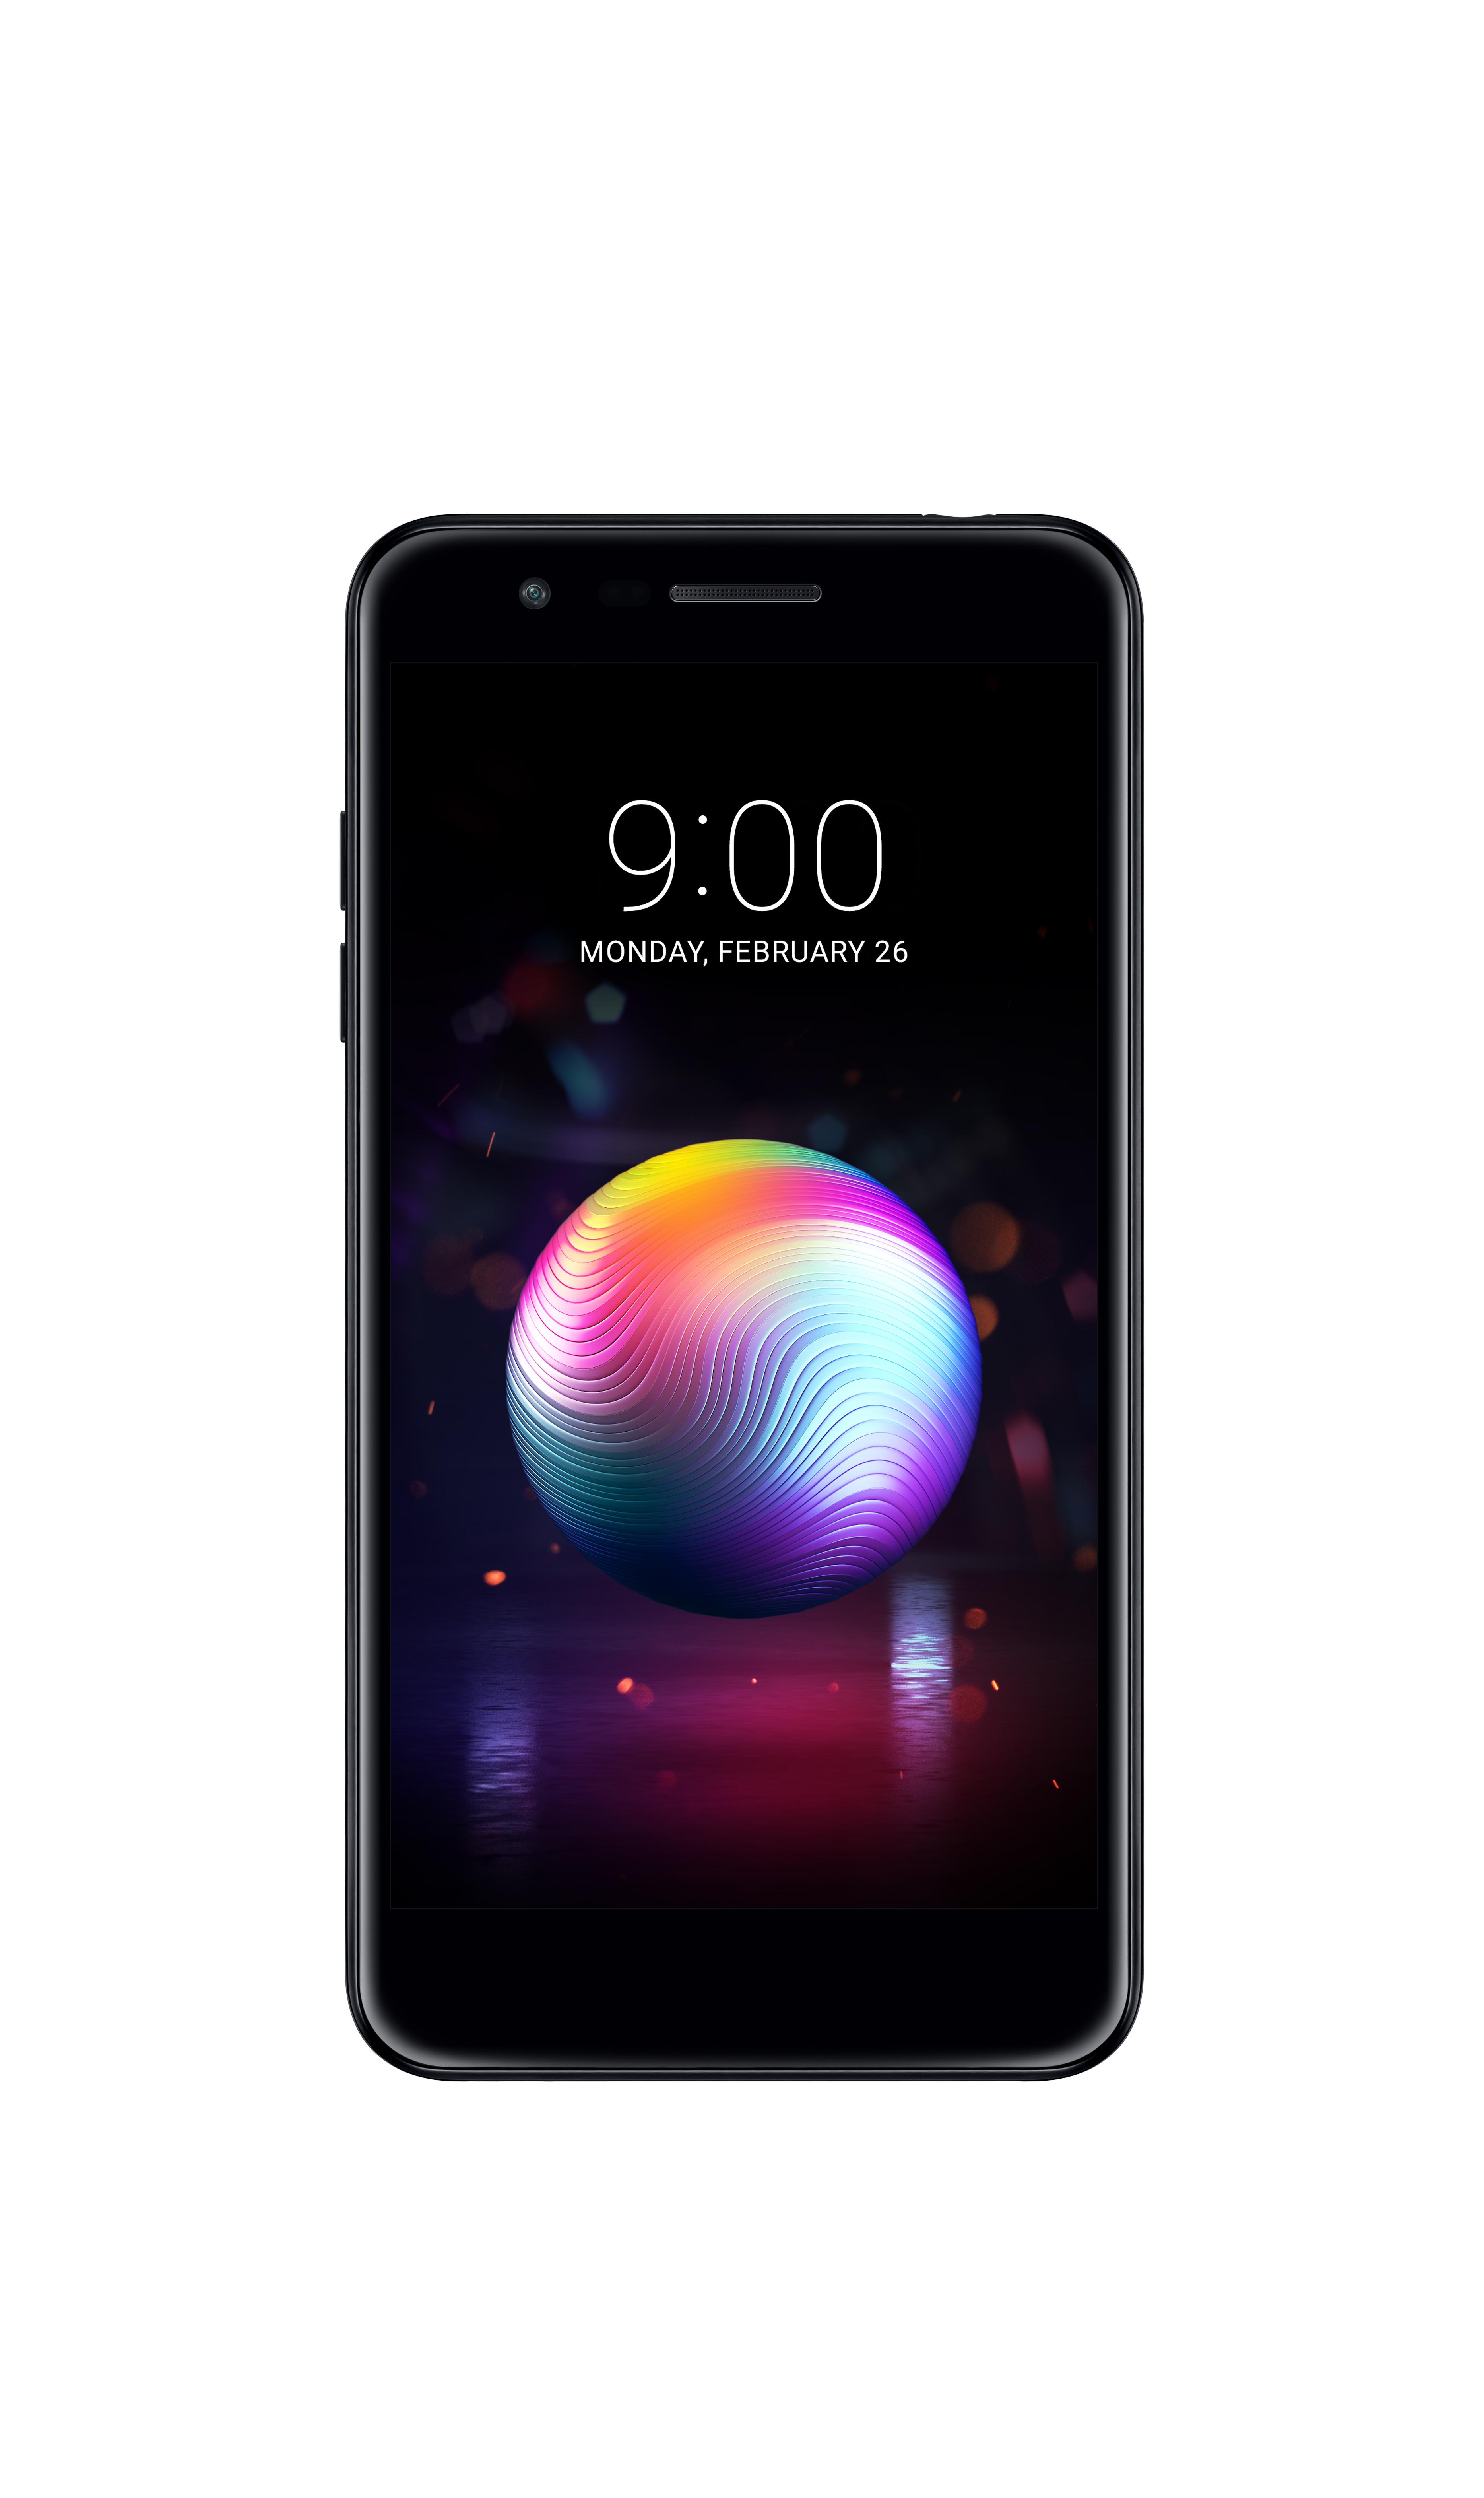 Lg Smartphone 16 gb ram 2 gb. vodafone quadband - K11 Mx410 Nero Vodafone